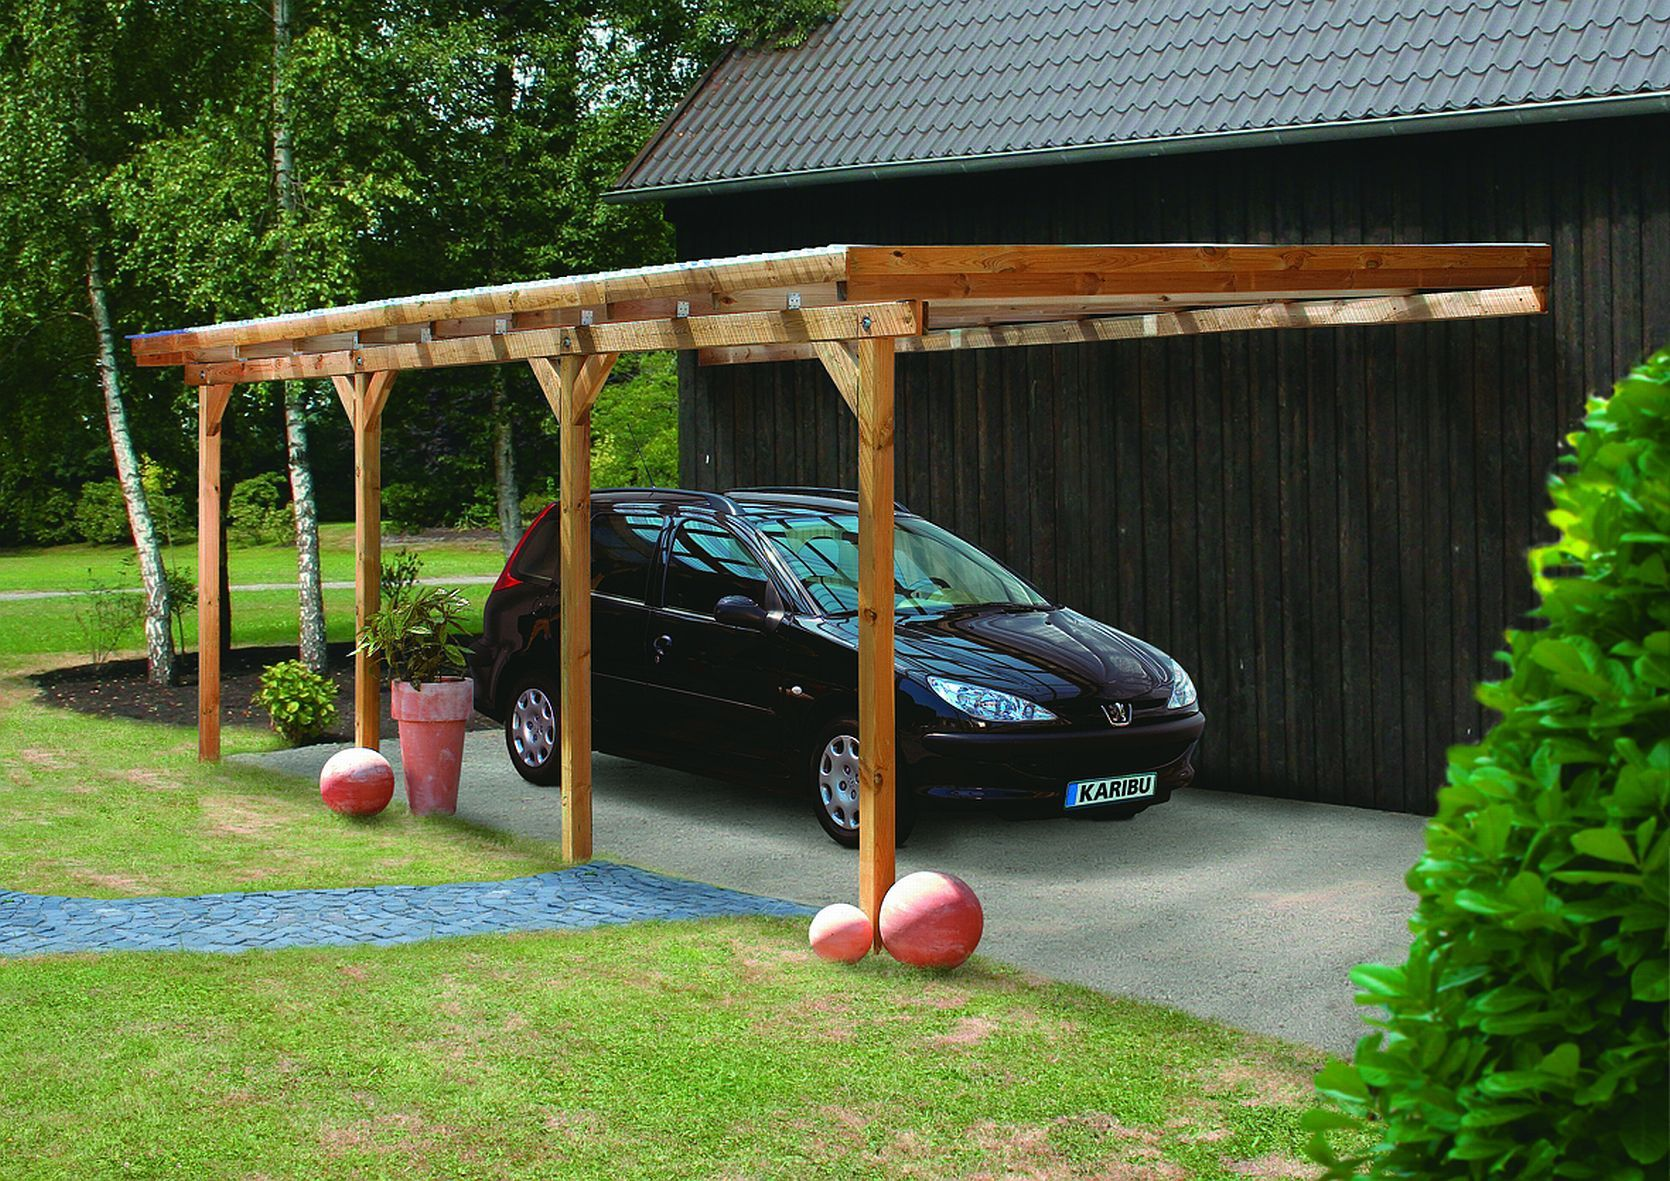 Carport Prix carport bois 22.58 m2 adams 2 l363xp622xh249cm | carports | pinterest